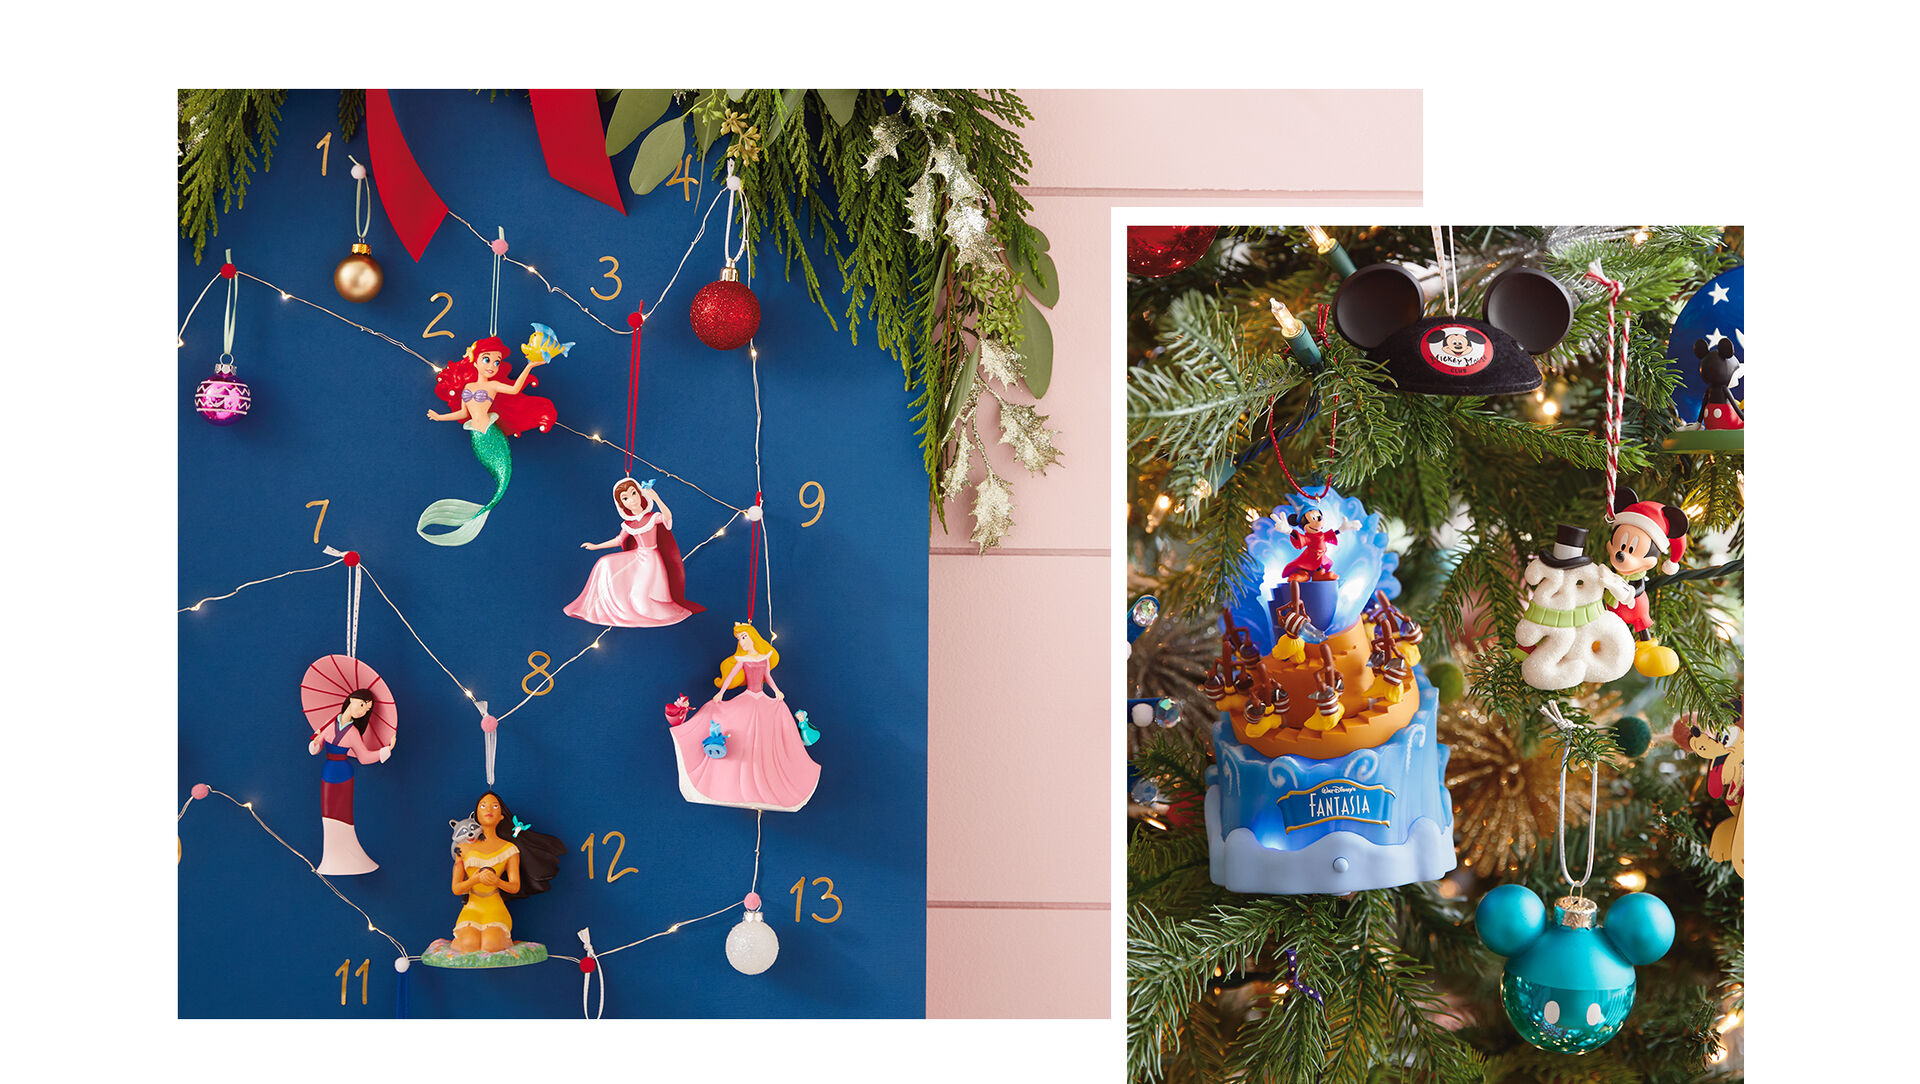 Hallmark Christmas Ornaments 2020 Hallmark Dream Book 2020 | Browse Keepsake Ornaments Online | Hallmark